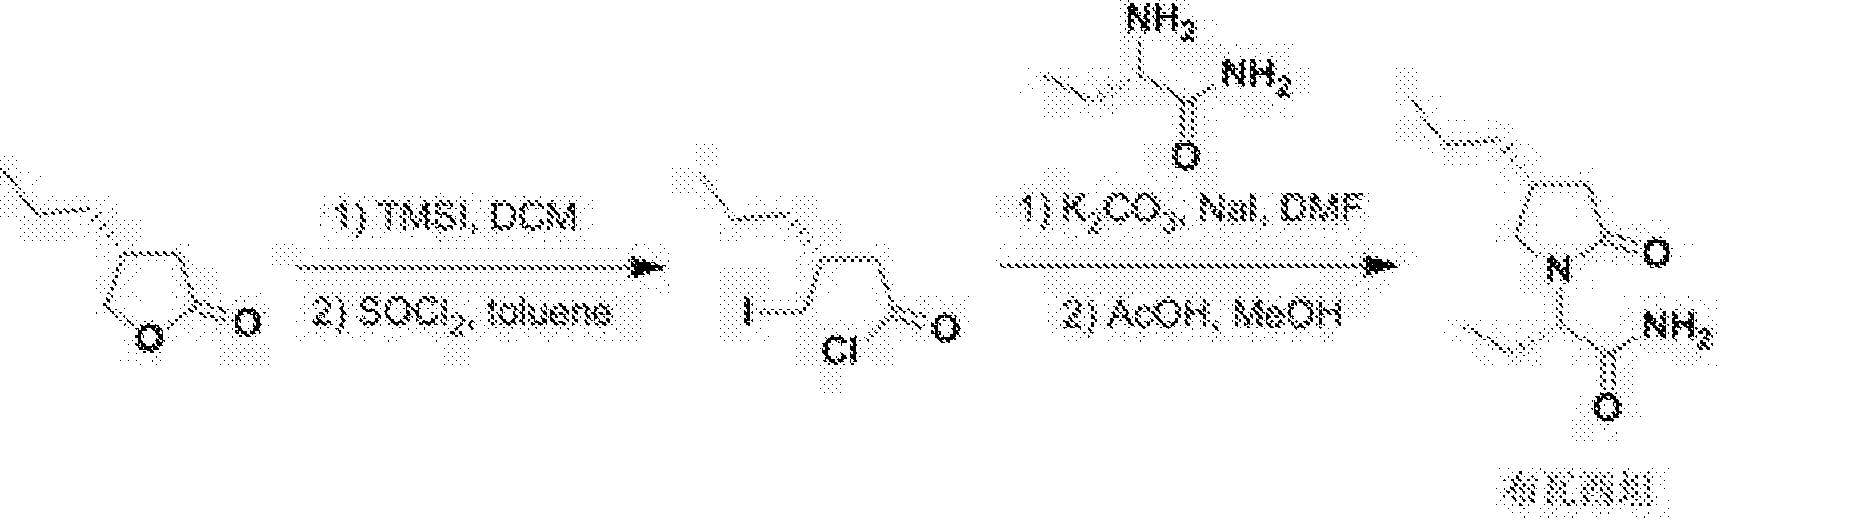 Figure CN105837535AD00042